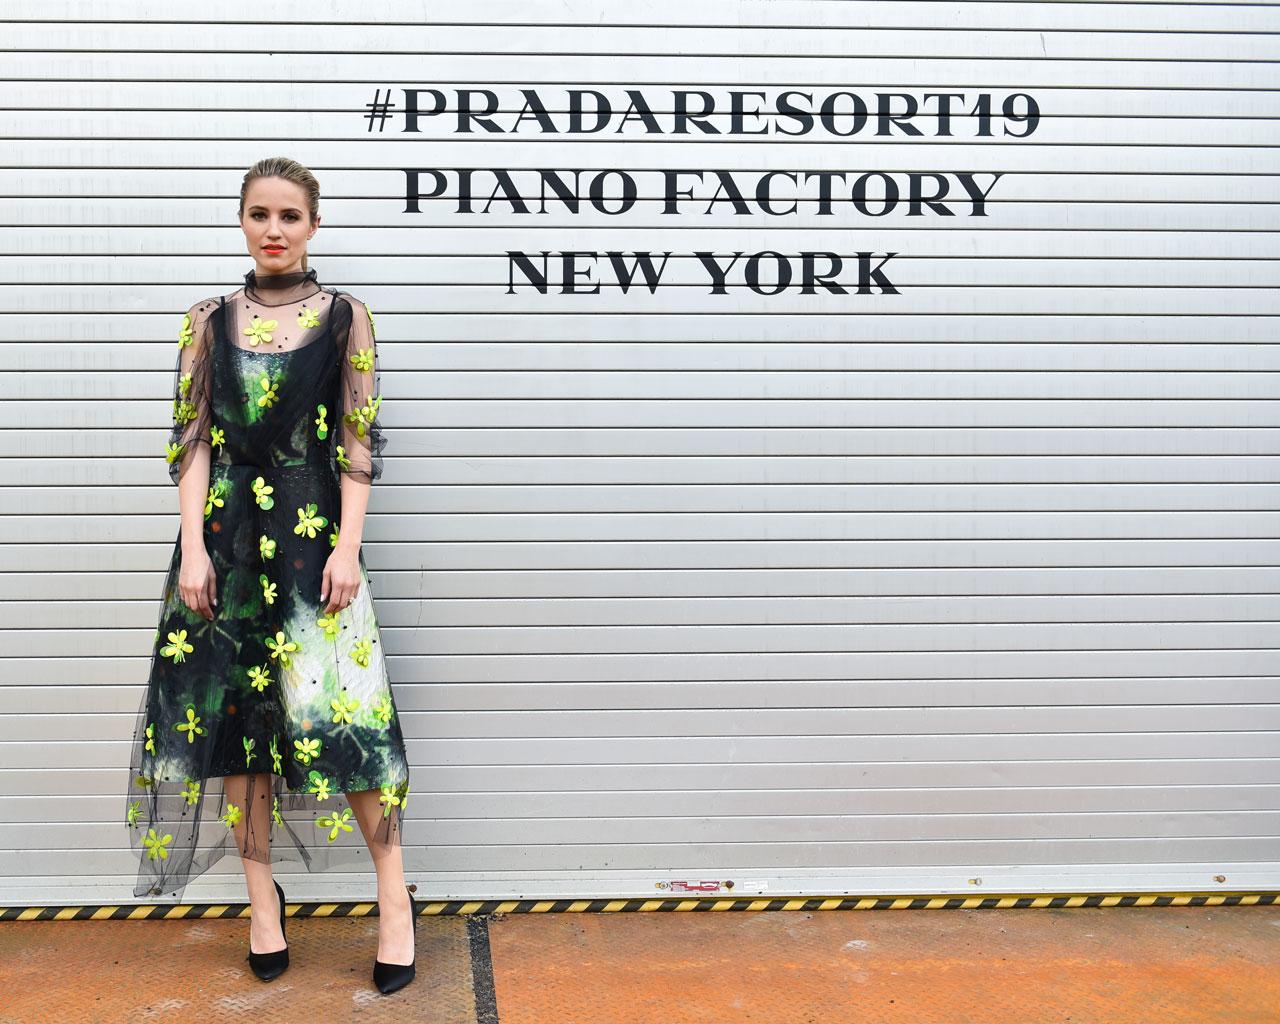 A-list red carpet arrivals at the Prada Resort 2019 show